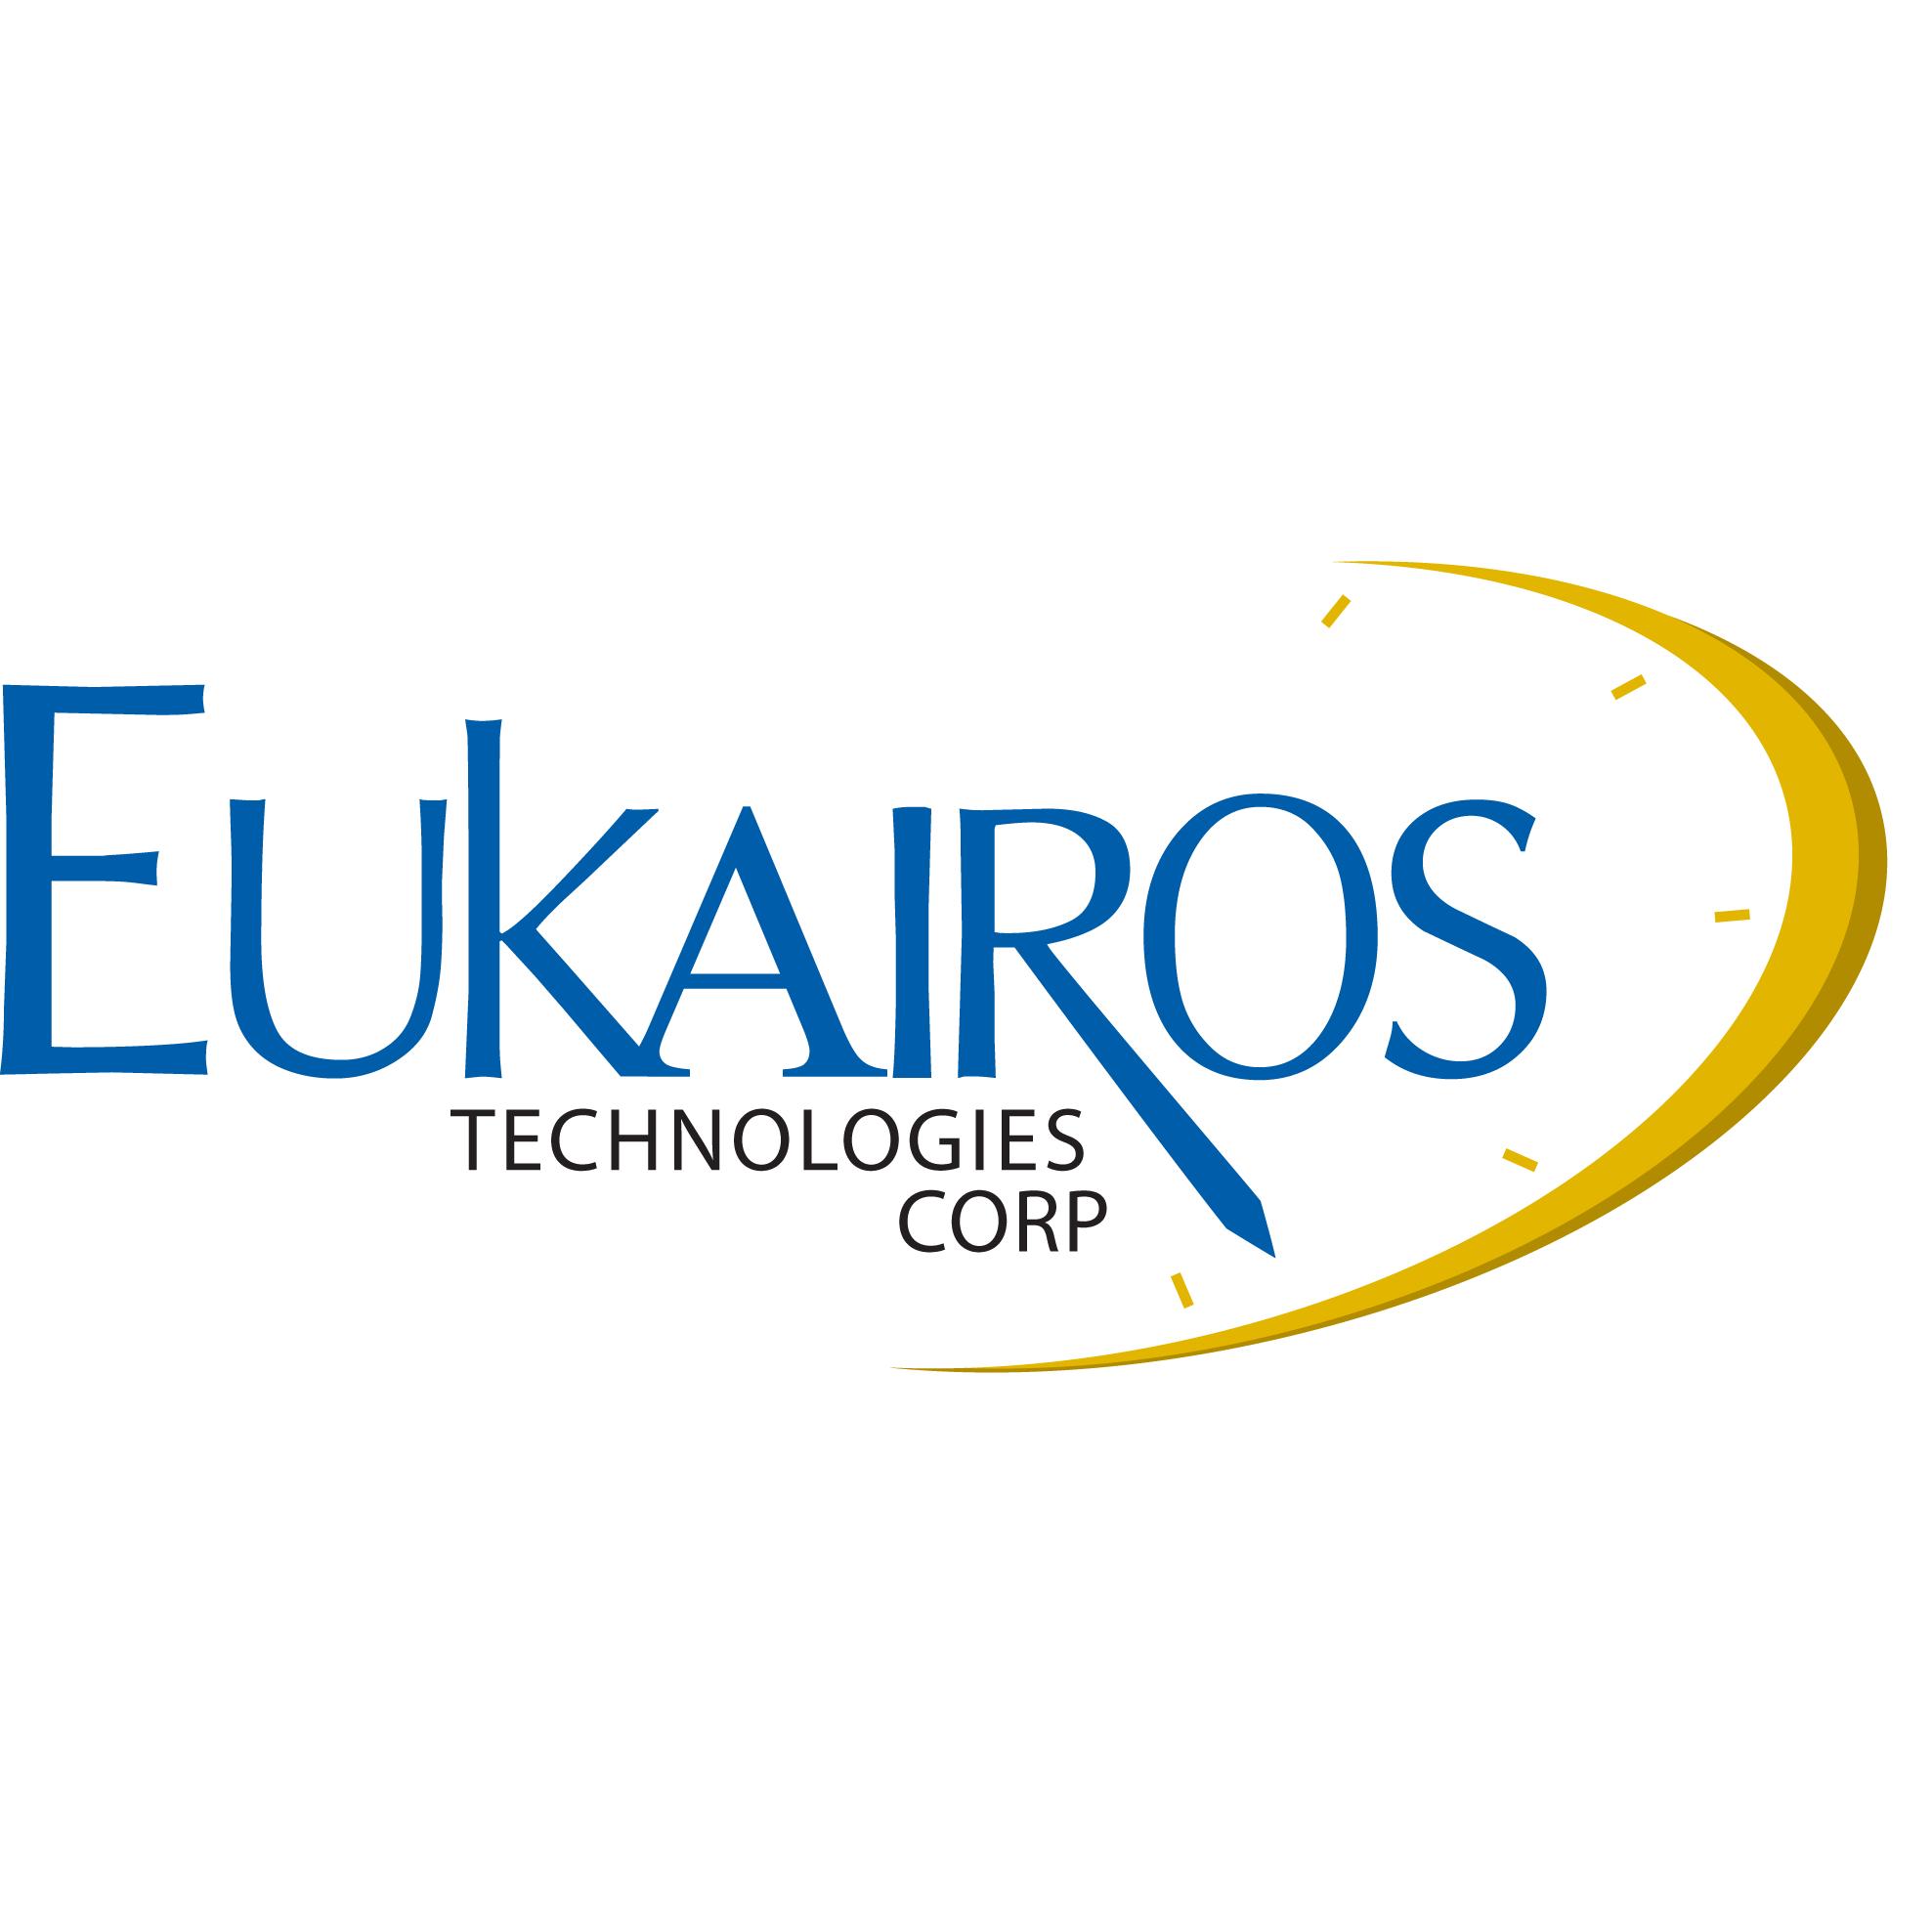 Eukairos Technologies Corp.